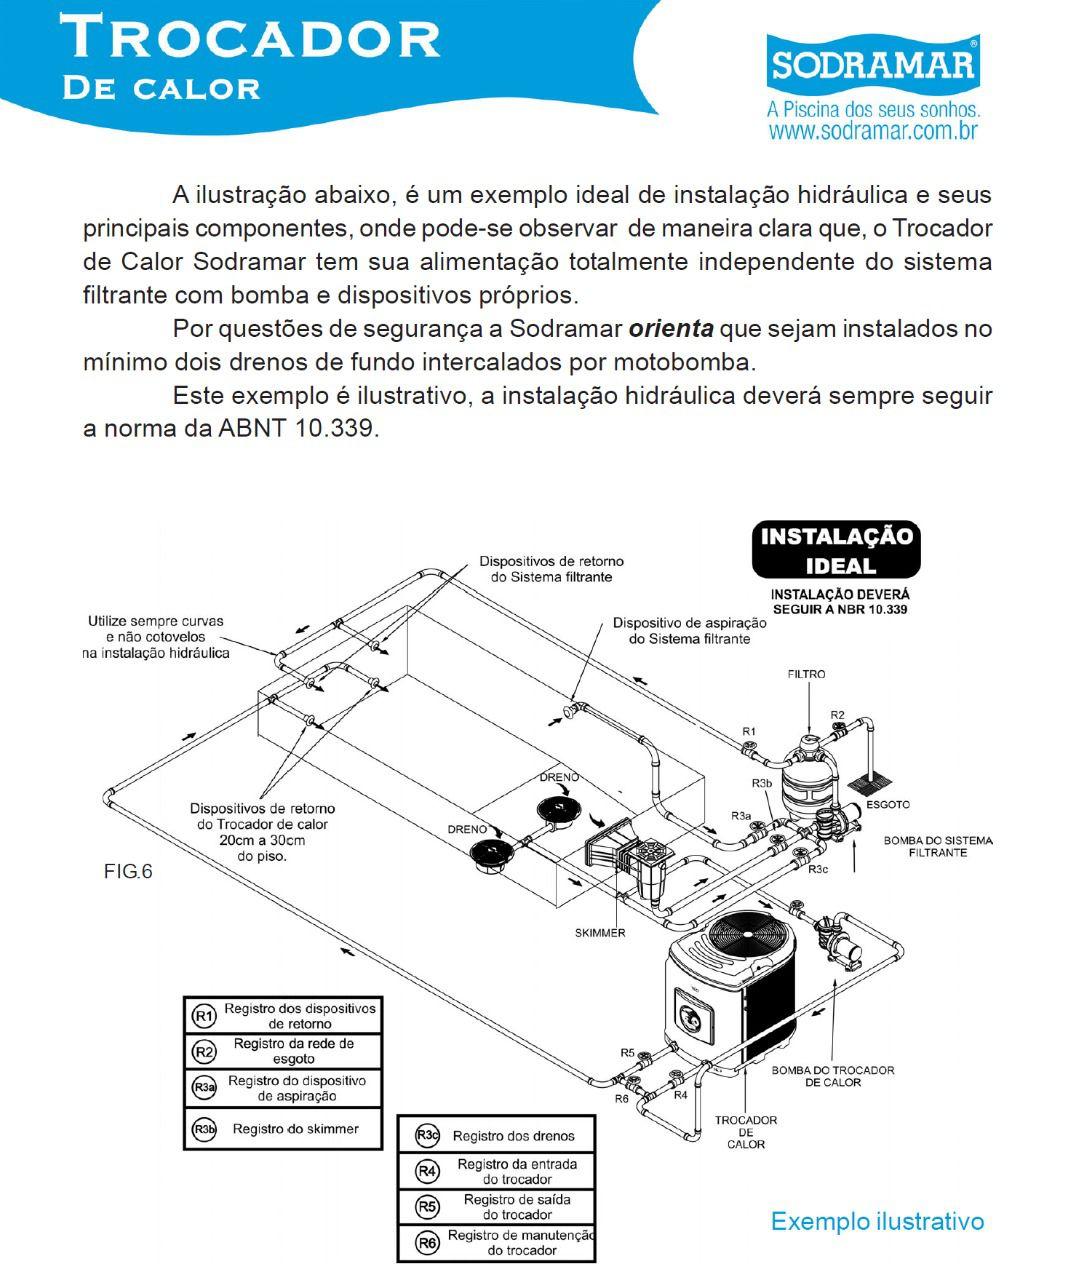 Aquecedor de piscina Yes - Trocador de Calor SD-40 220V - Bifásico